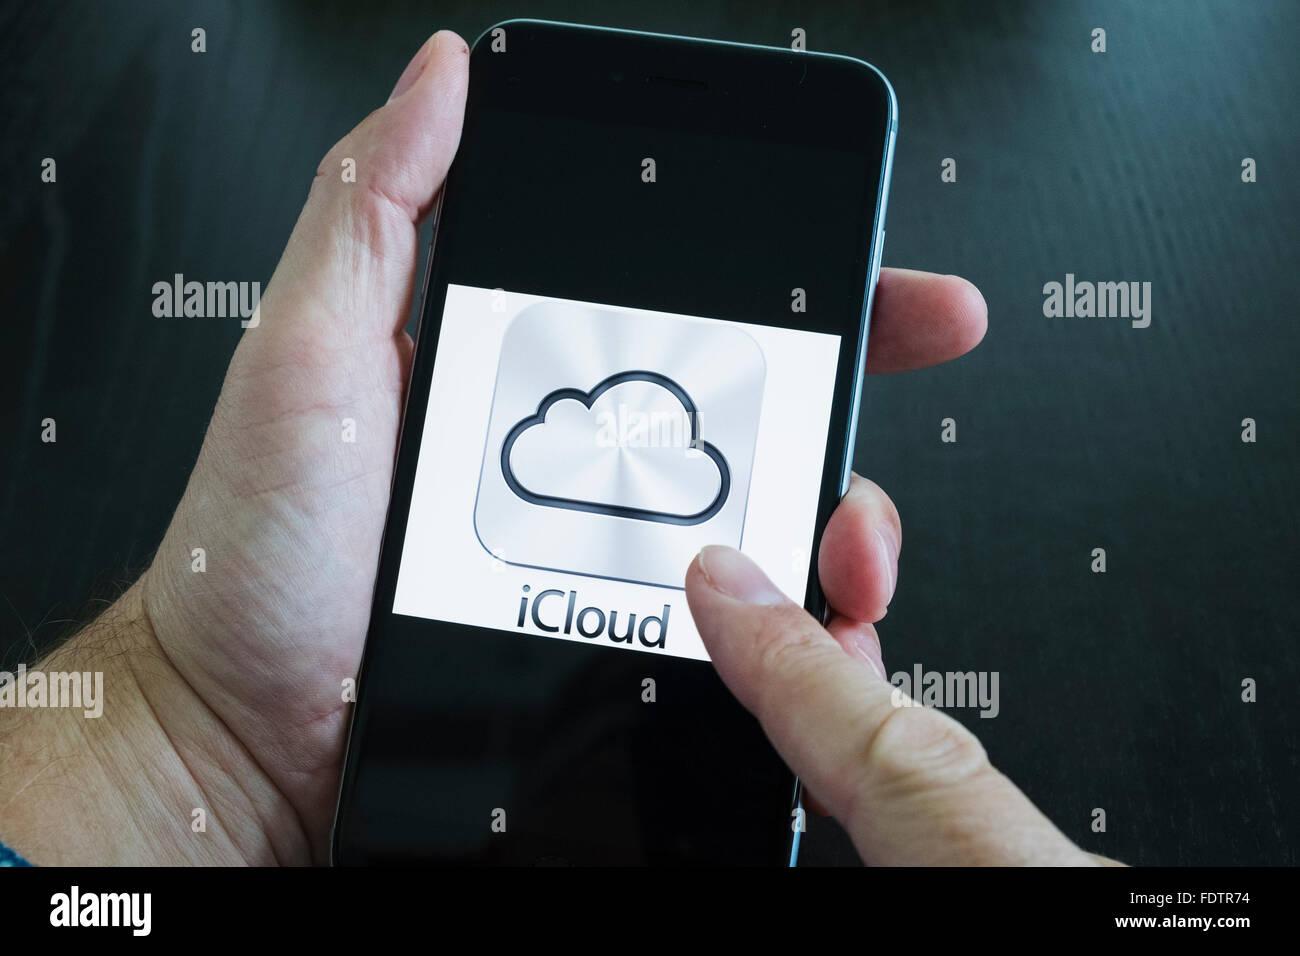 Apple iCloud online cloud storage logo on screen of iPhone 6 Plus smart phone - Stock Image